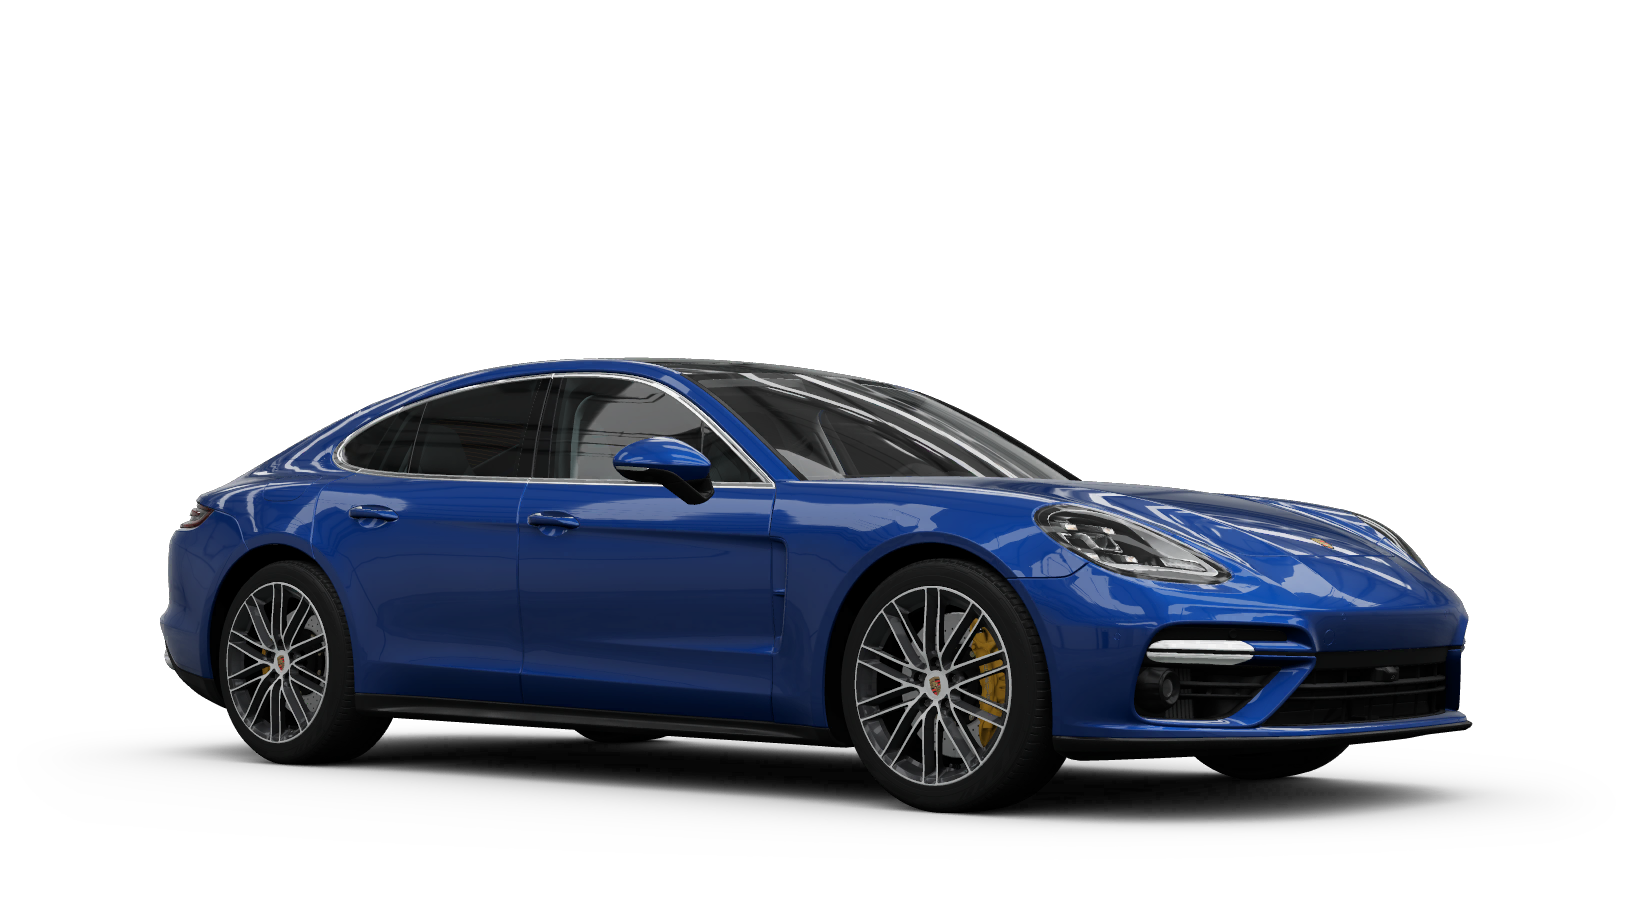 Porsche Panamera Turbo 2017 Forza Wiki Fandom